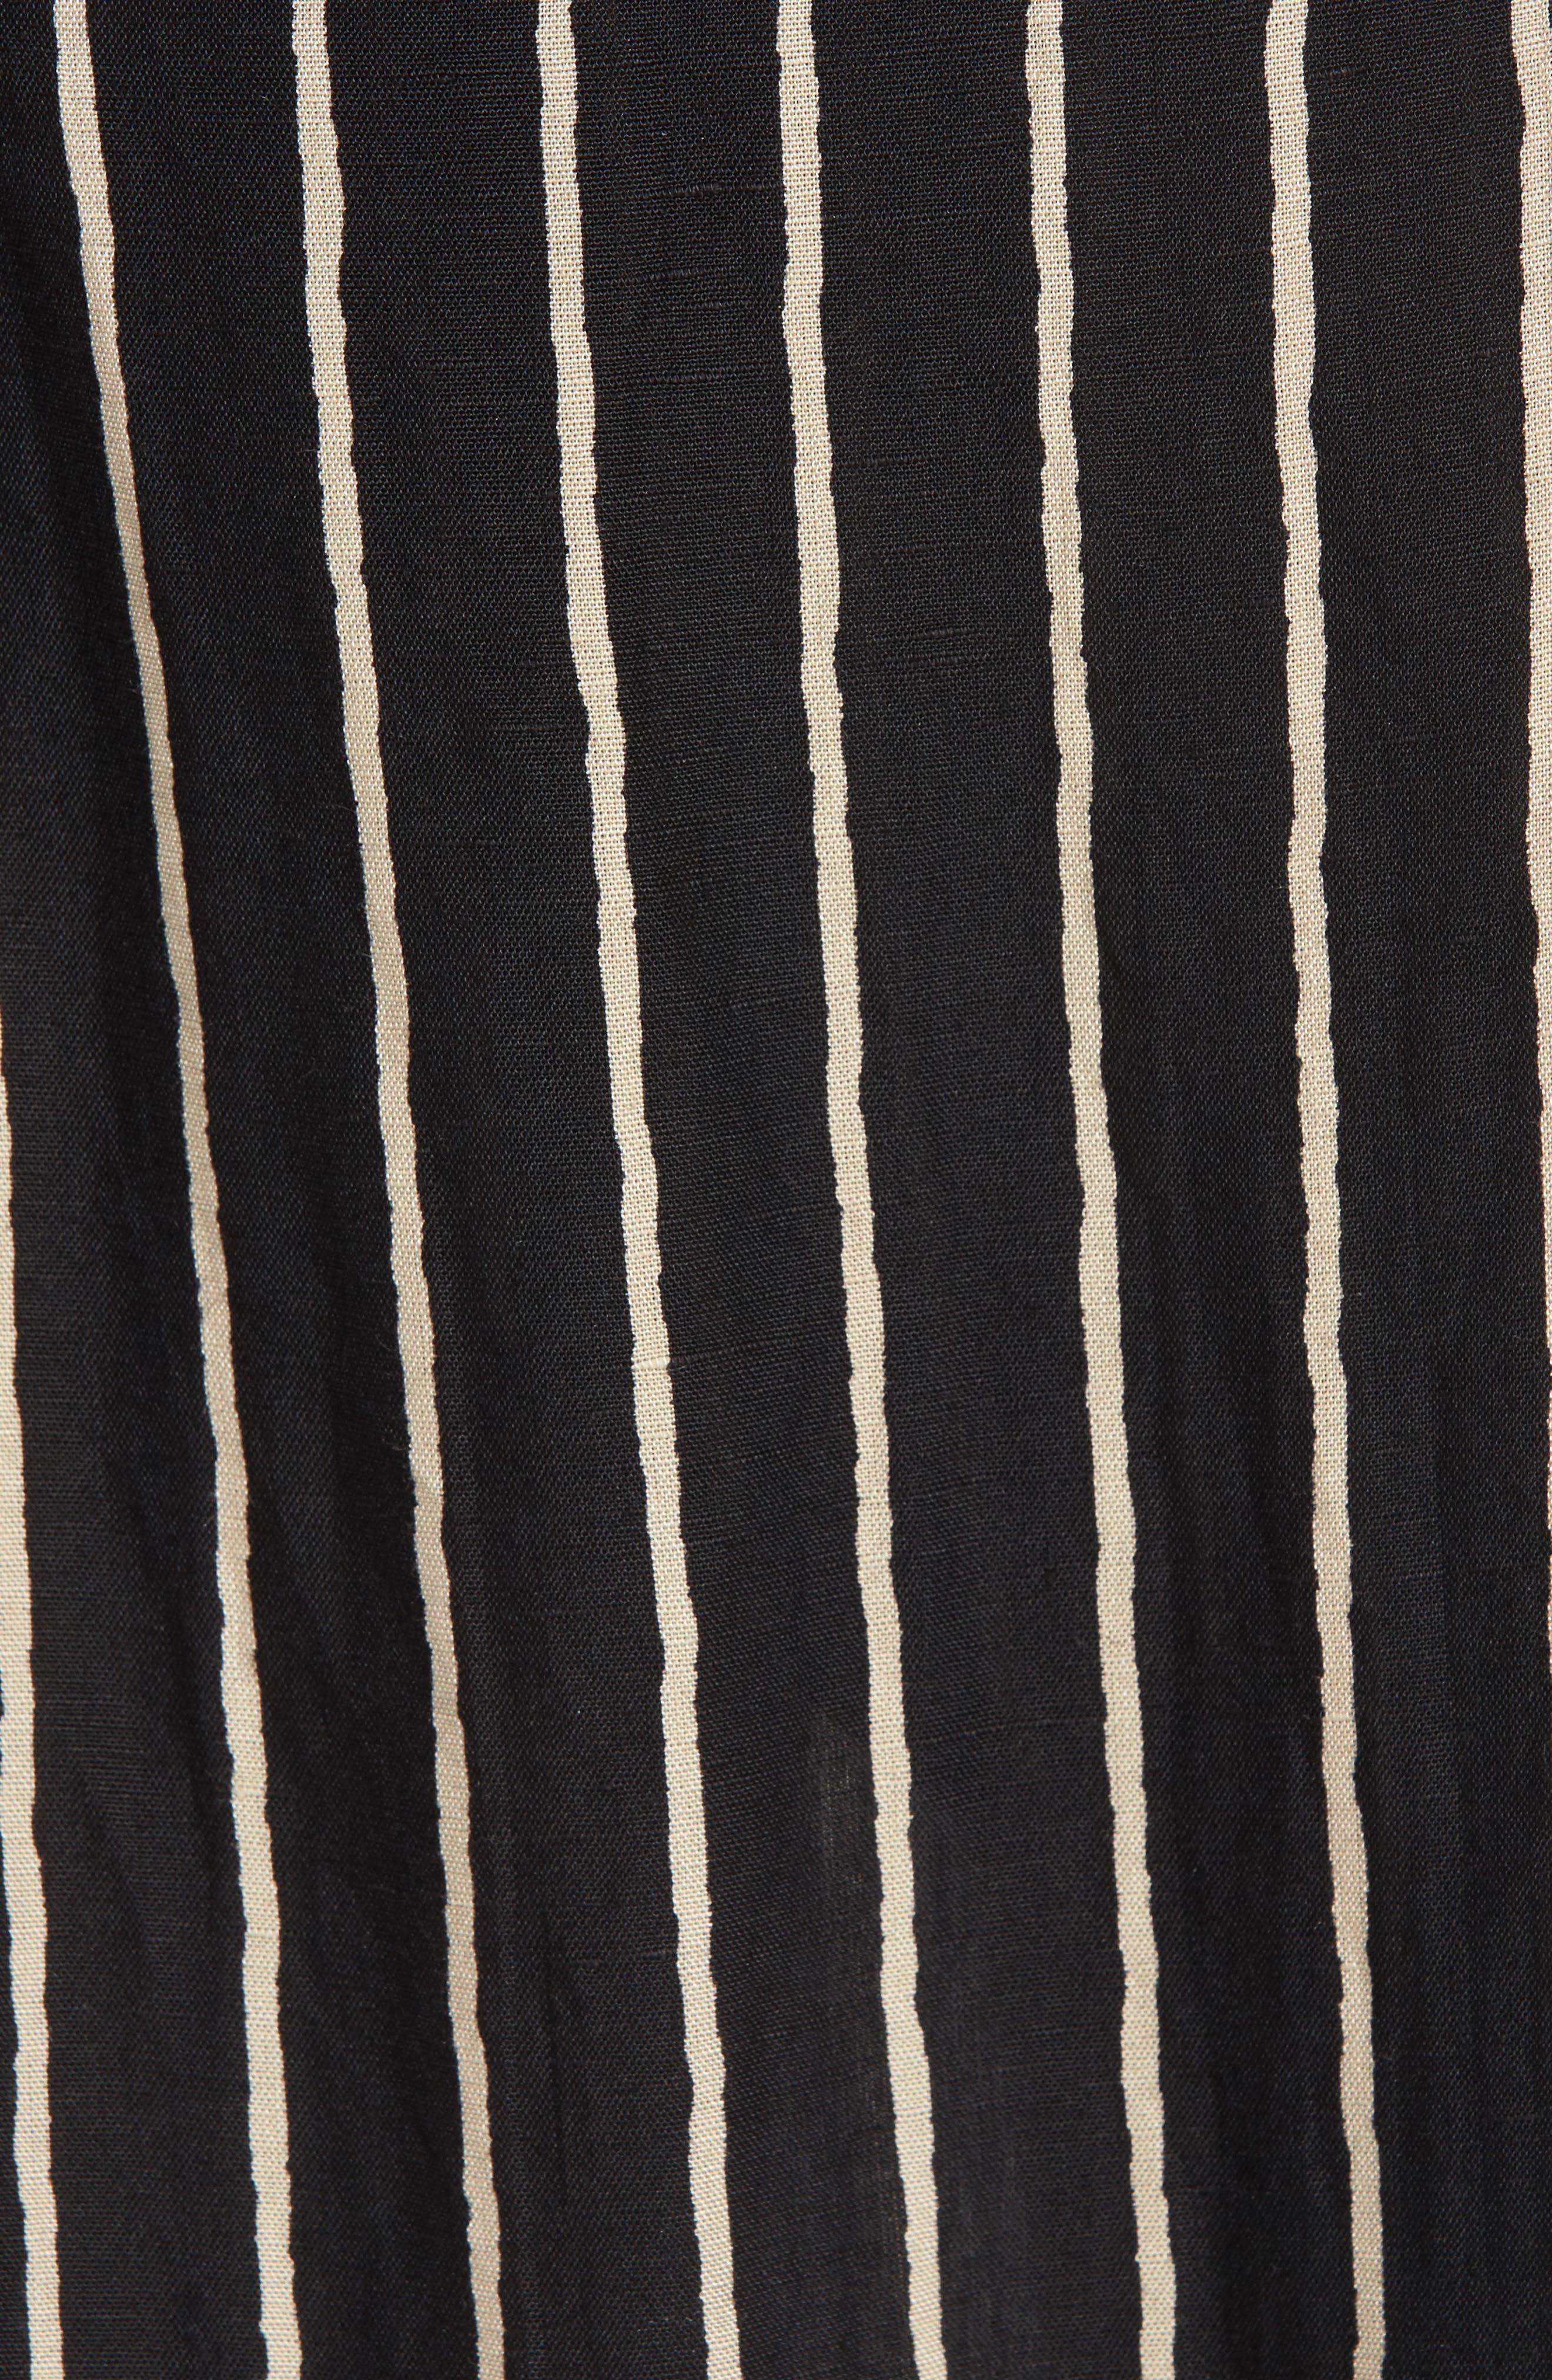 Strapless Faux Wrap Maxi Dress,                             Alternate thumbnail 4, color,                             Black